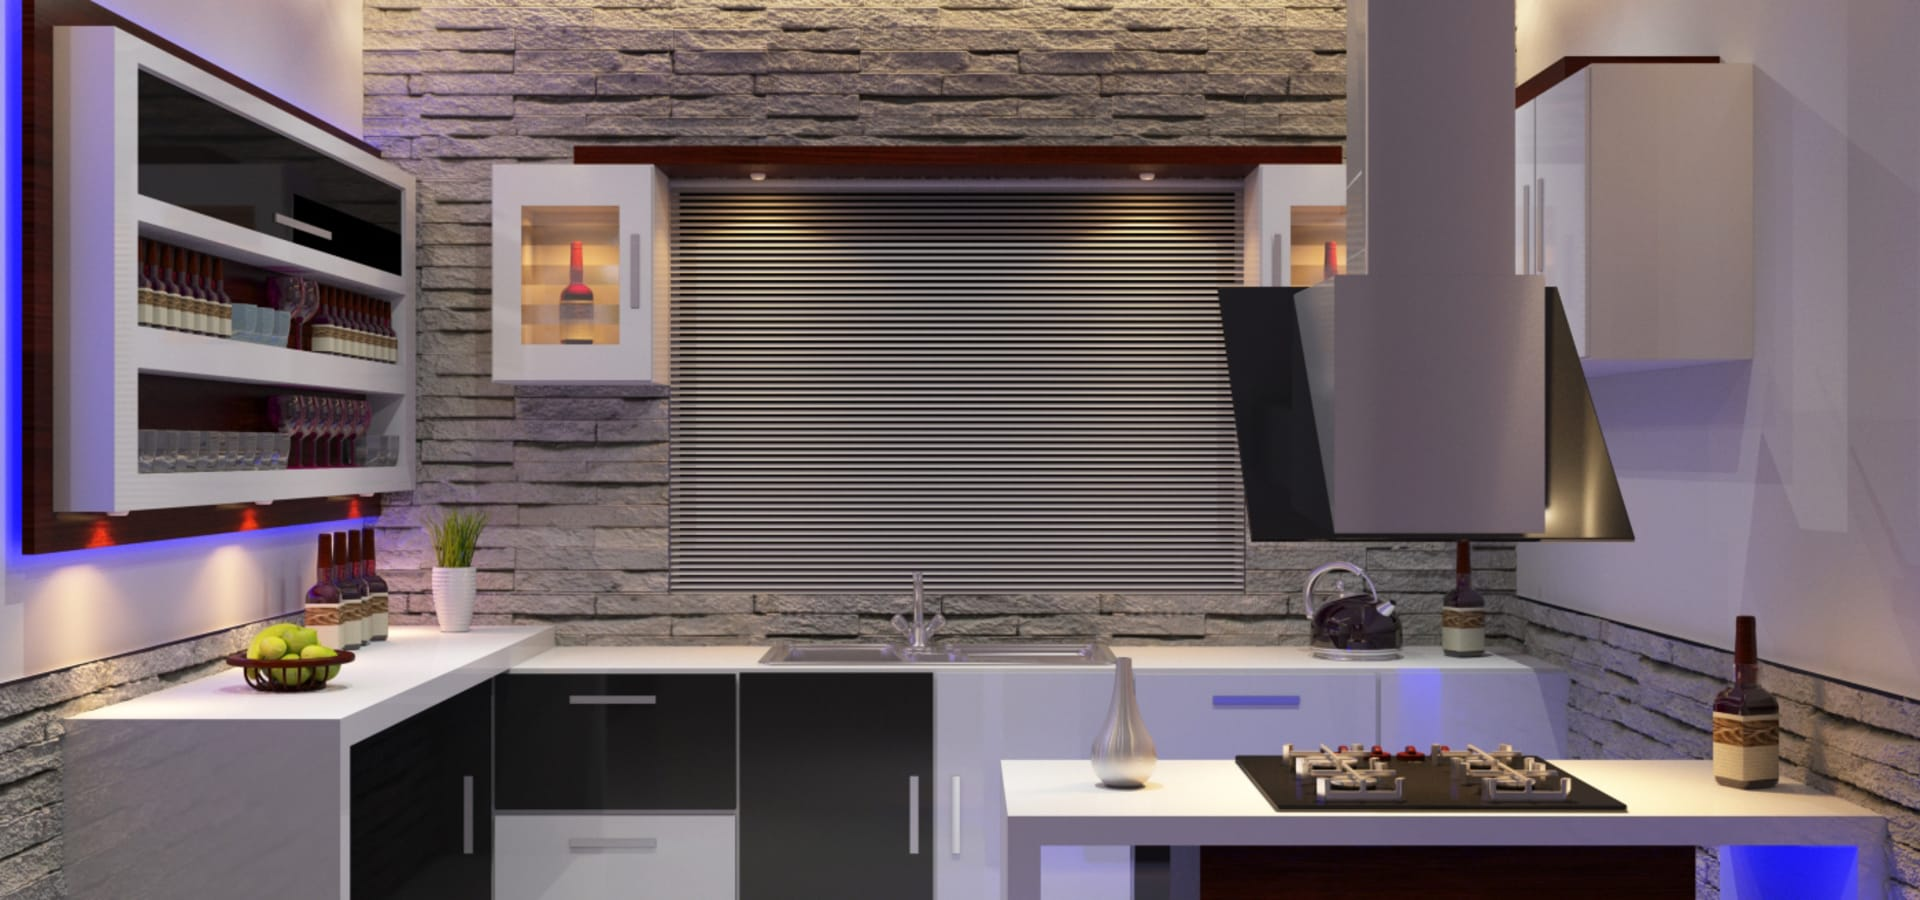 Modular Kitchen von Nimble Interiors | homify